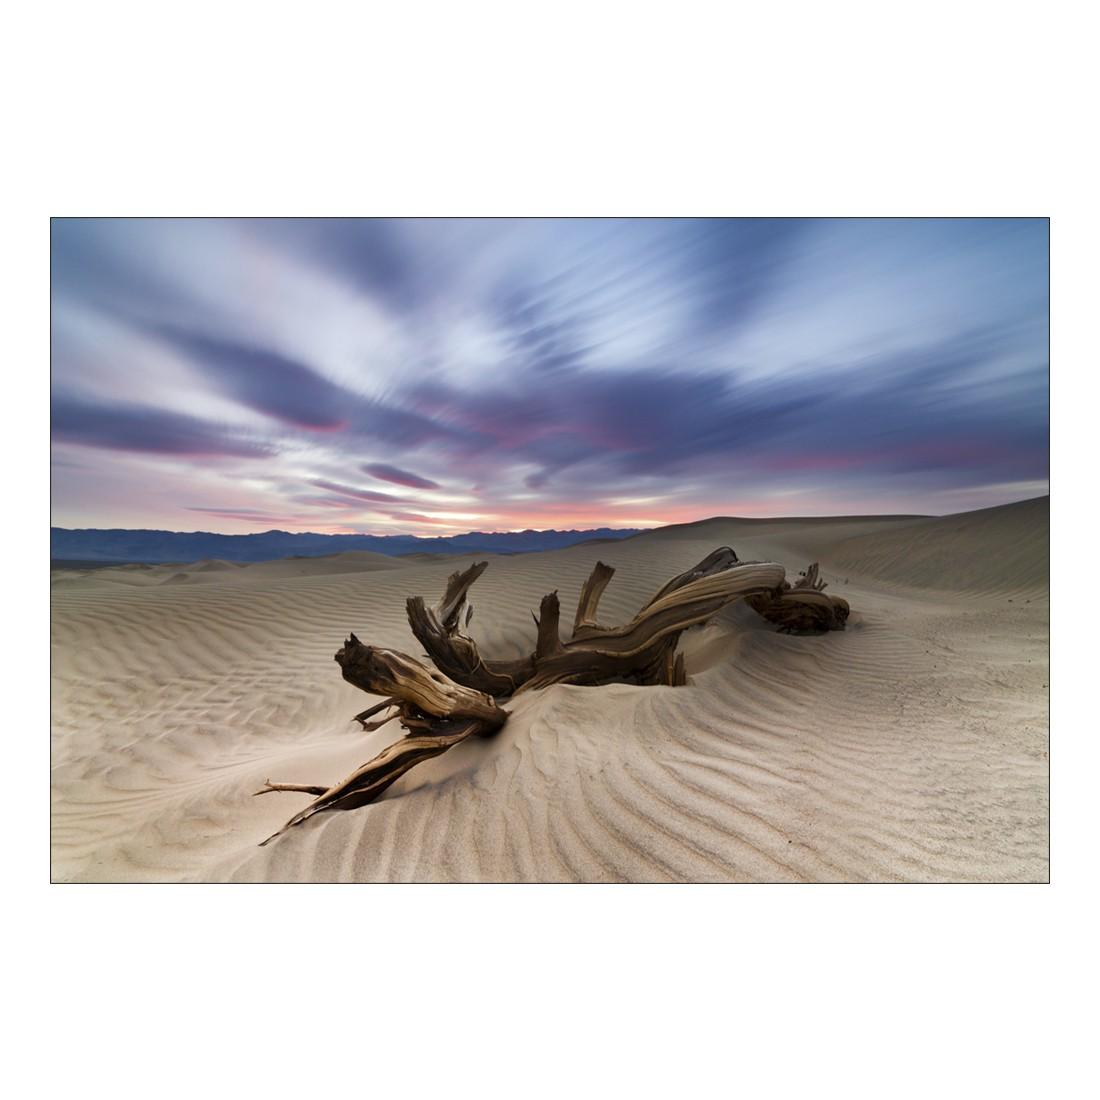 Acrylglasbild Tree Trunk in Desert – Abmessung 75×50 cm, Gallery of Innovative Art online kaufen